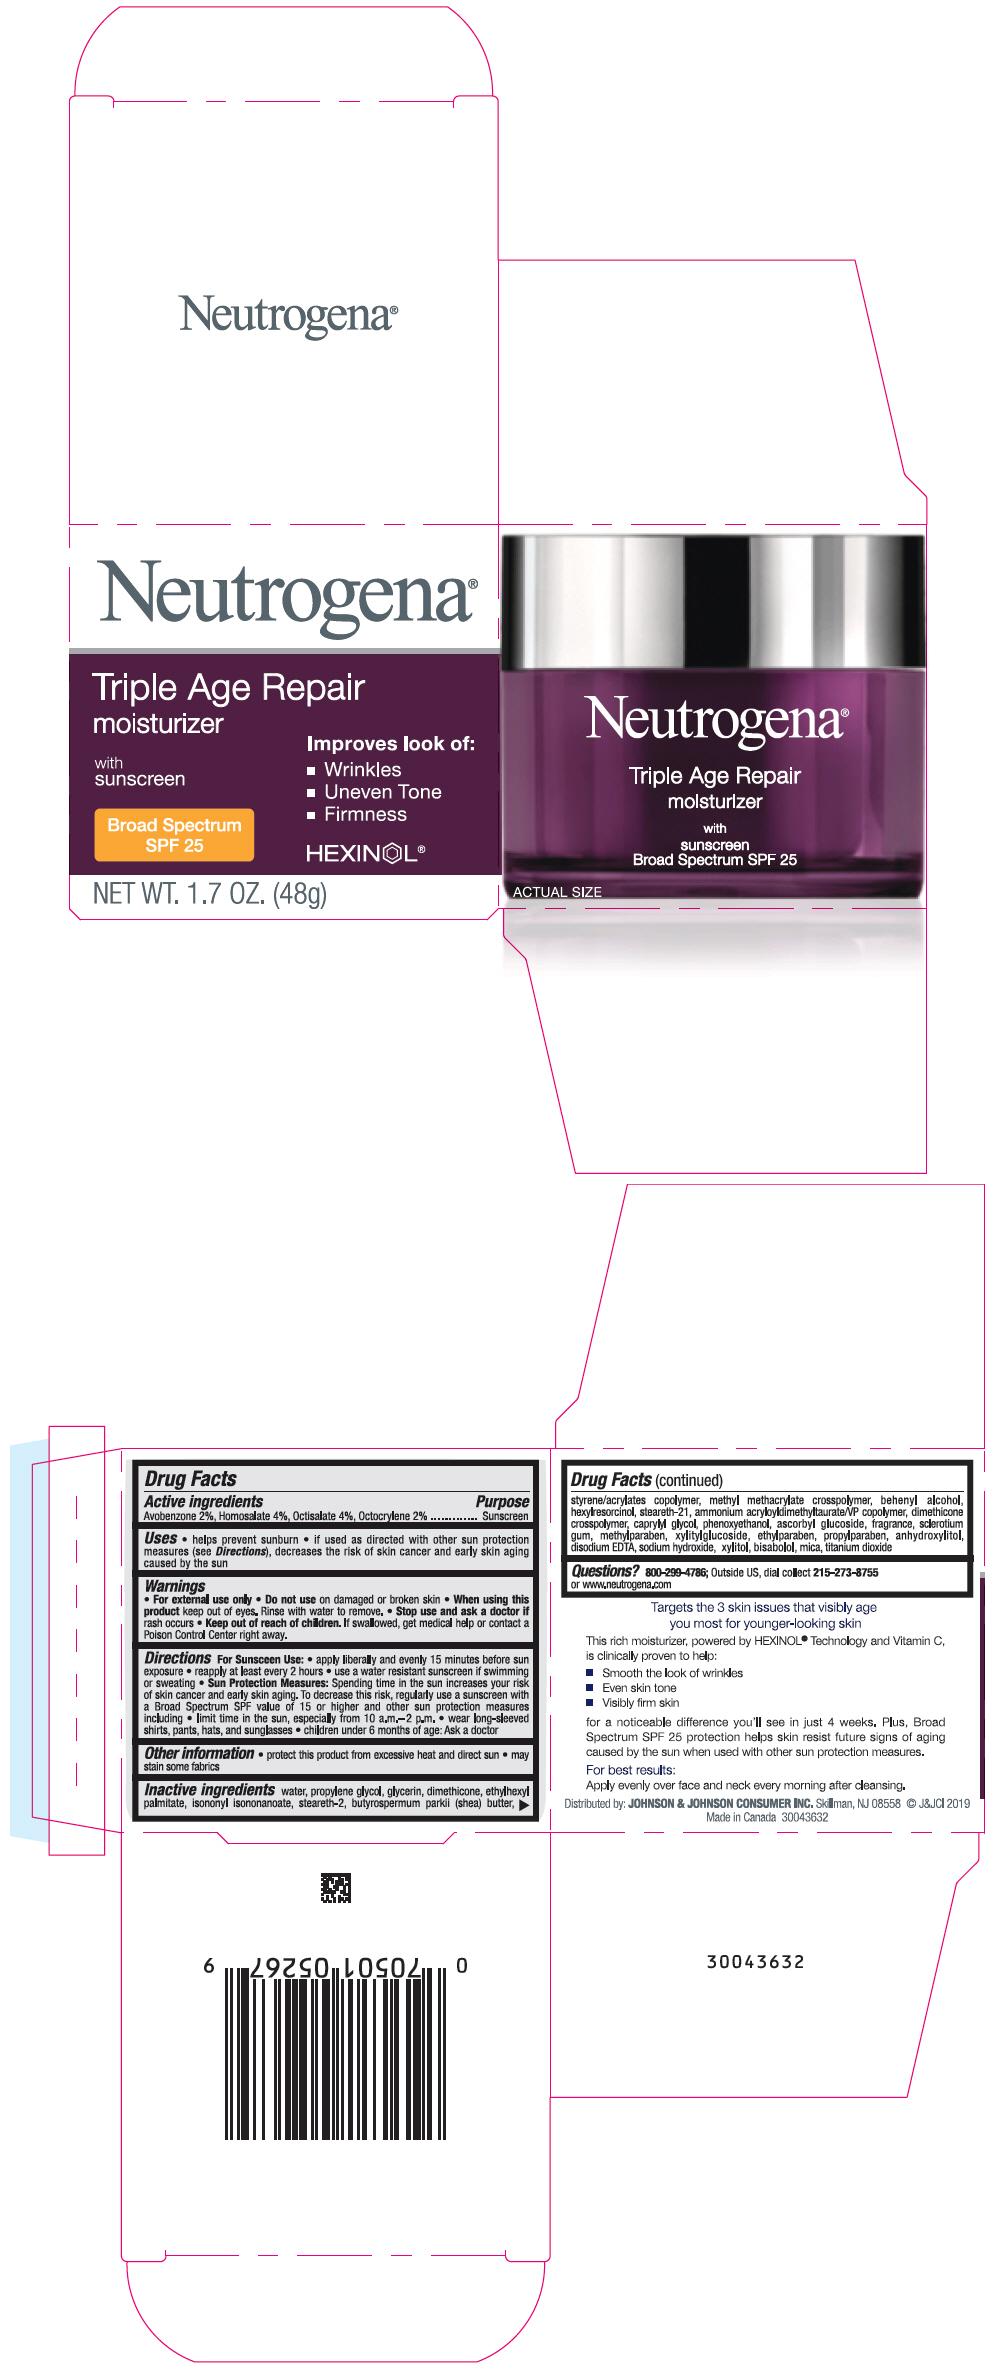 Avobenzone, Homosalate, Octisalate, and Octocrylene (Neutrogena Triple Age Repair Moisturizer with Sunscreen Broad Spectrum SPF 25)